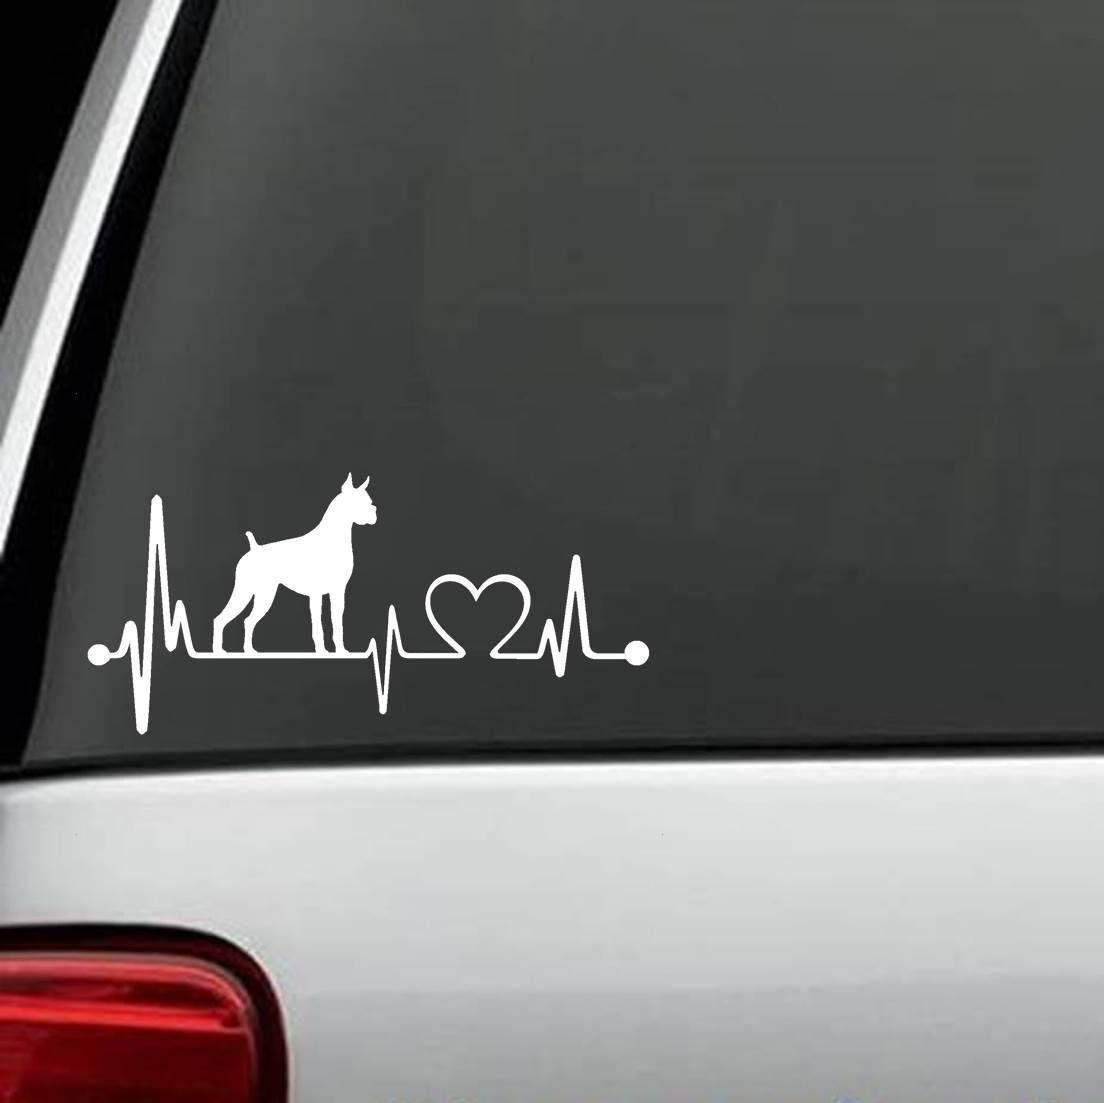 B1092 Pit Bull Pitbull Dog LOVE Decal Sticker for Car Truck SUV Van LAPTOP